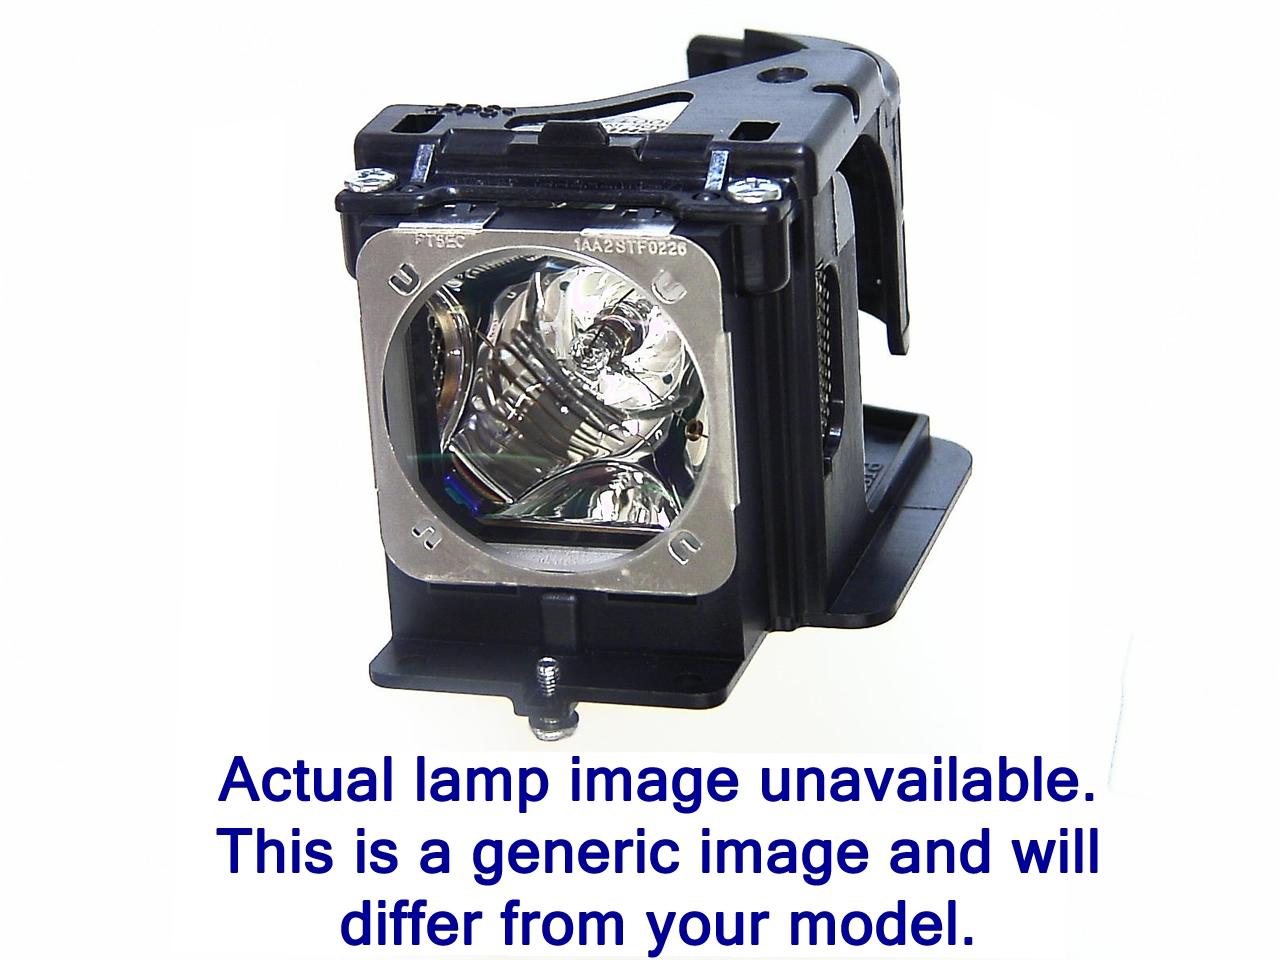 Diamond Lámpara For SANYO PDG-DHT8000 Proyector.